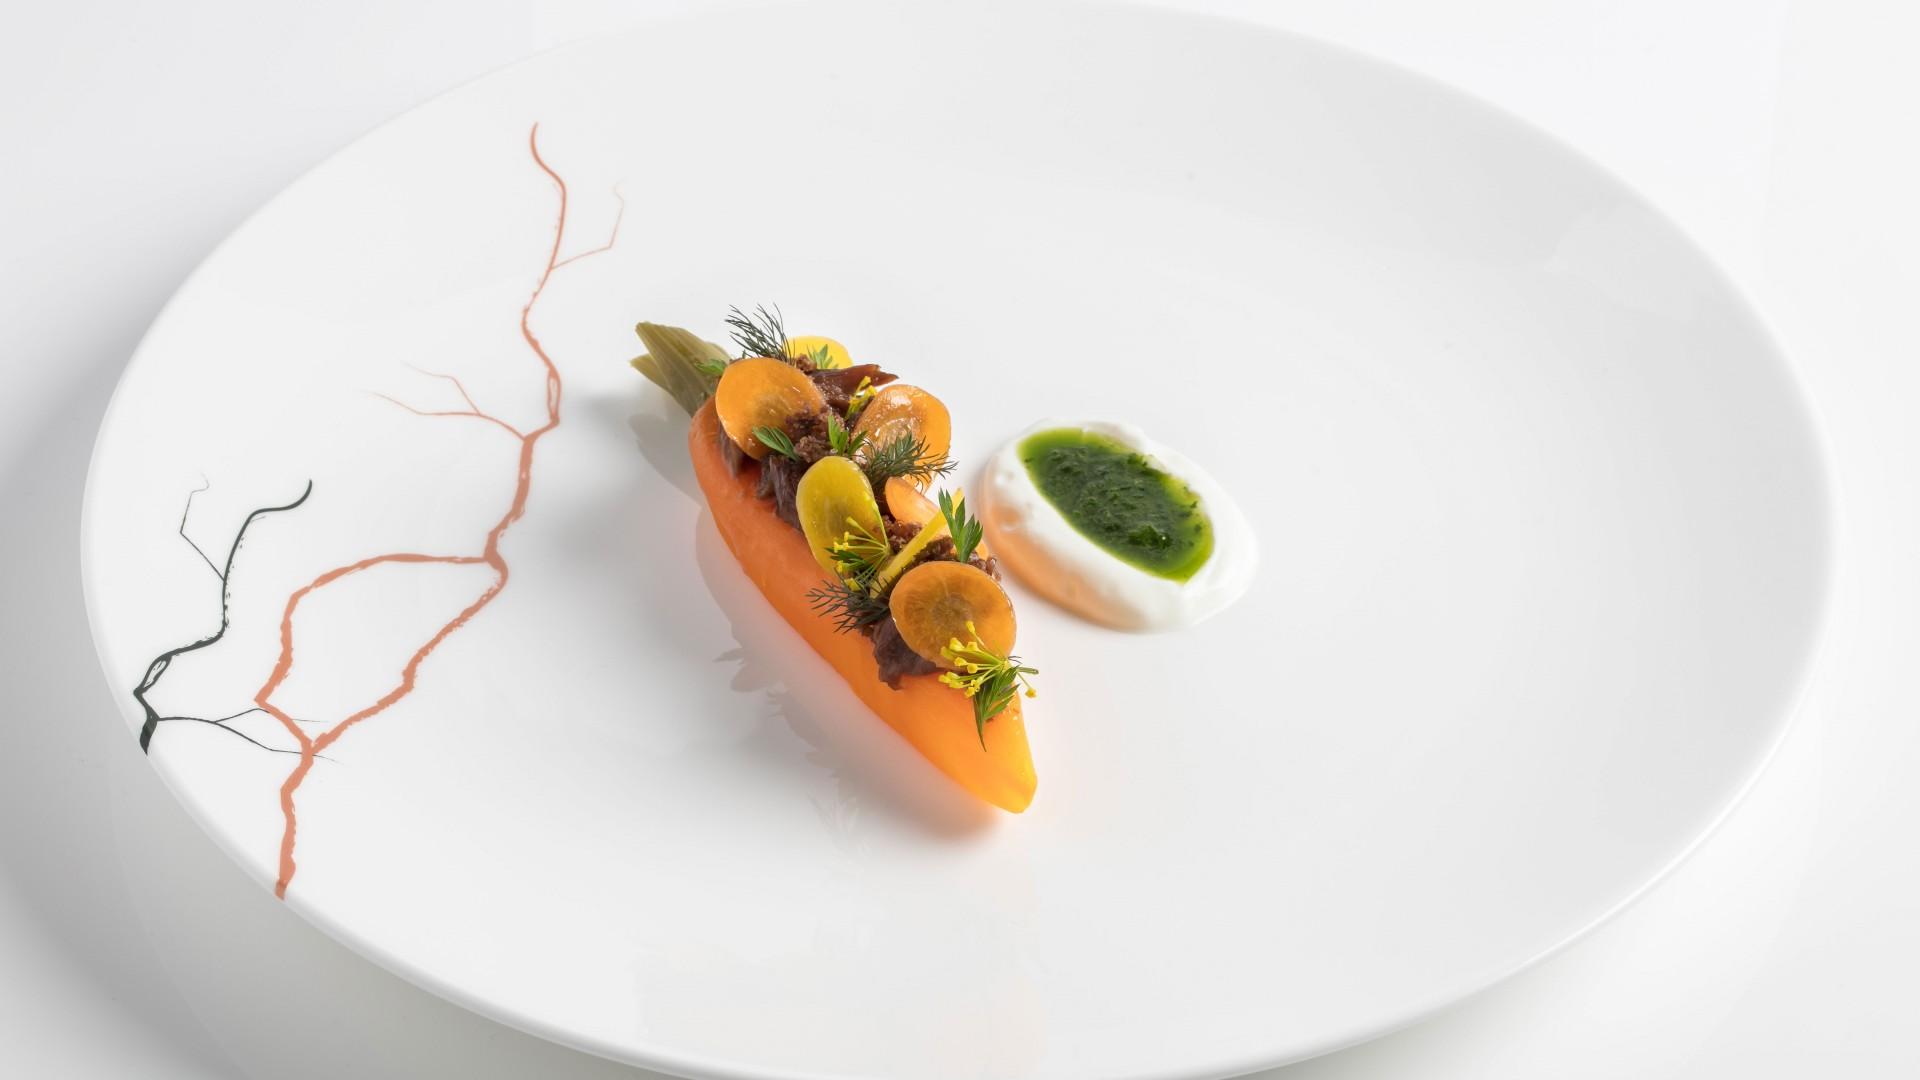 Lamb braised carrot with sheep's milk yoghurt